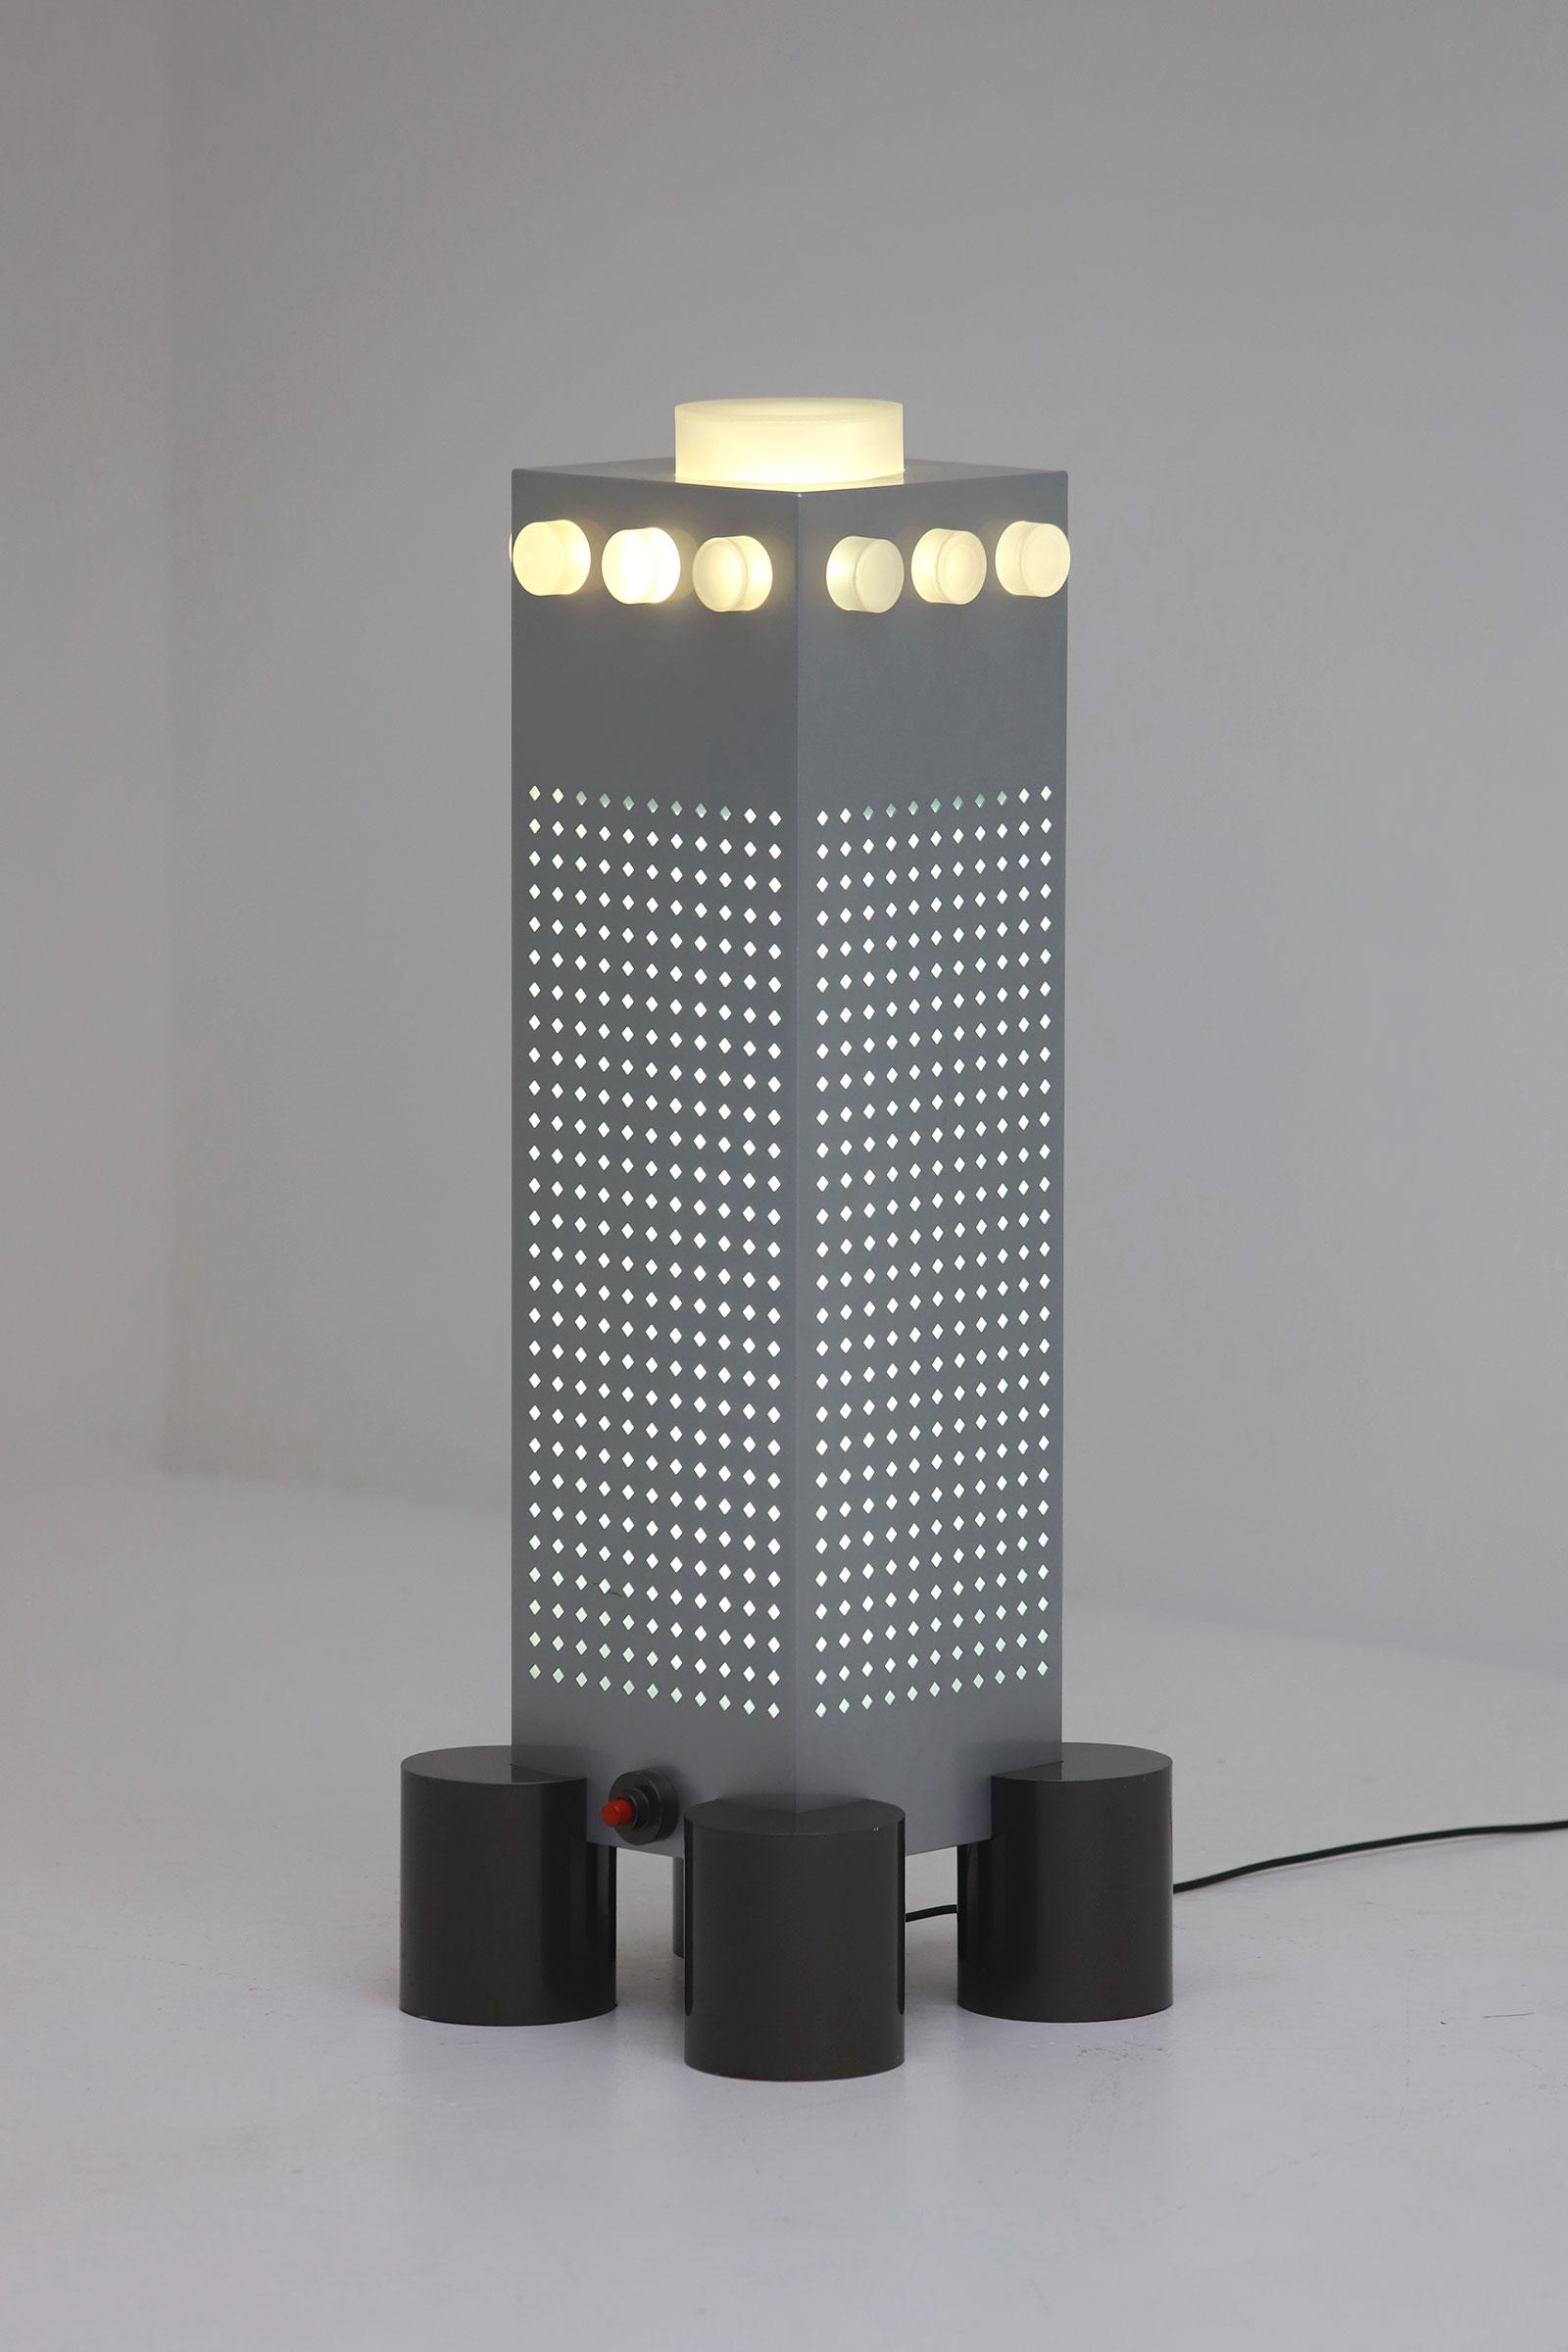 Matteo Thun & Andrea Lera wwf Tower Bieffeplast image 4